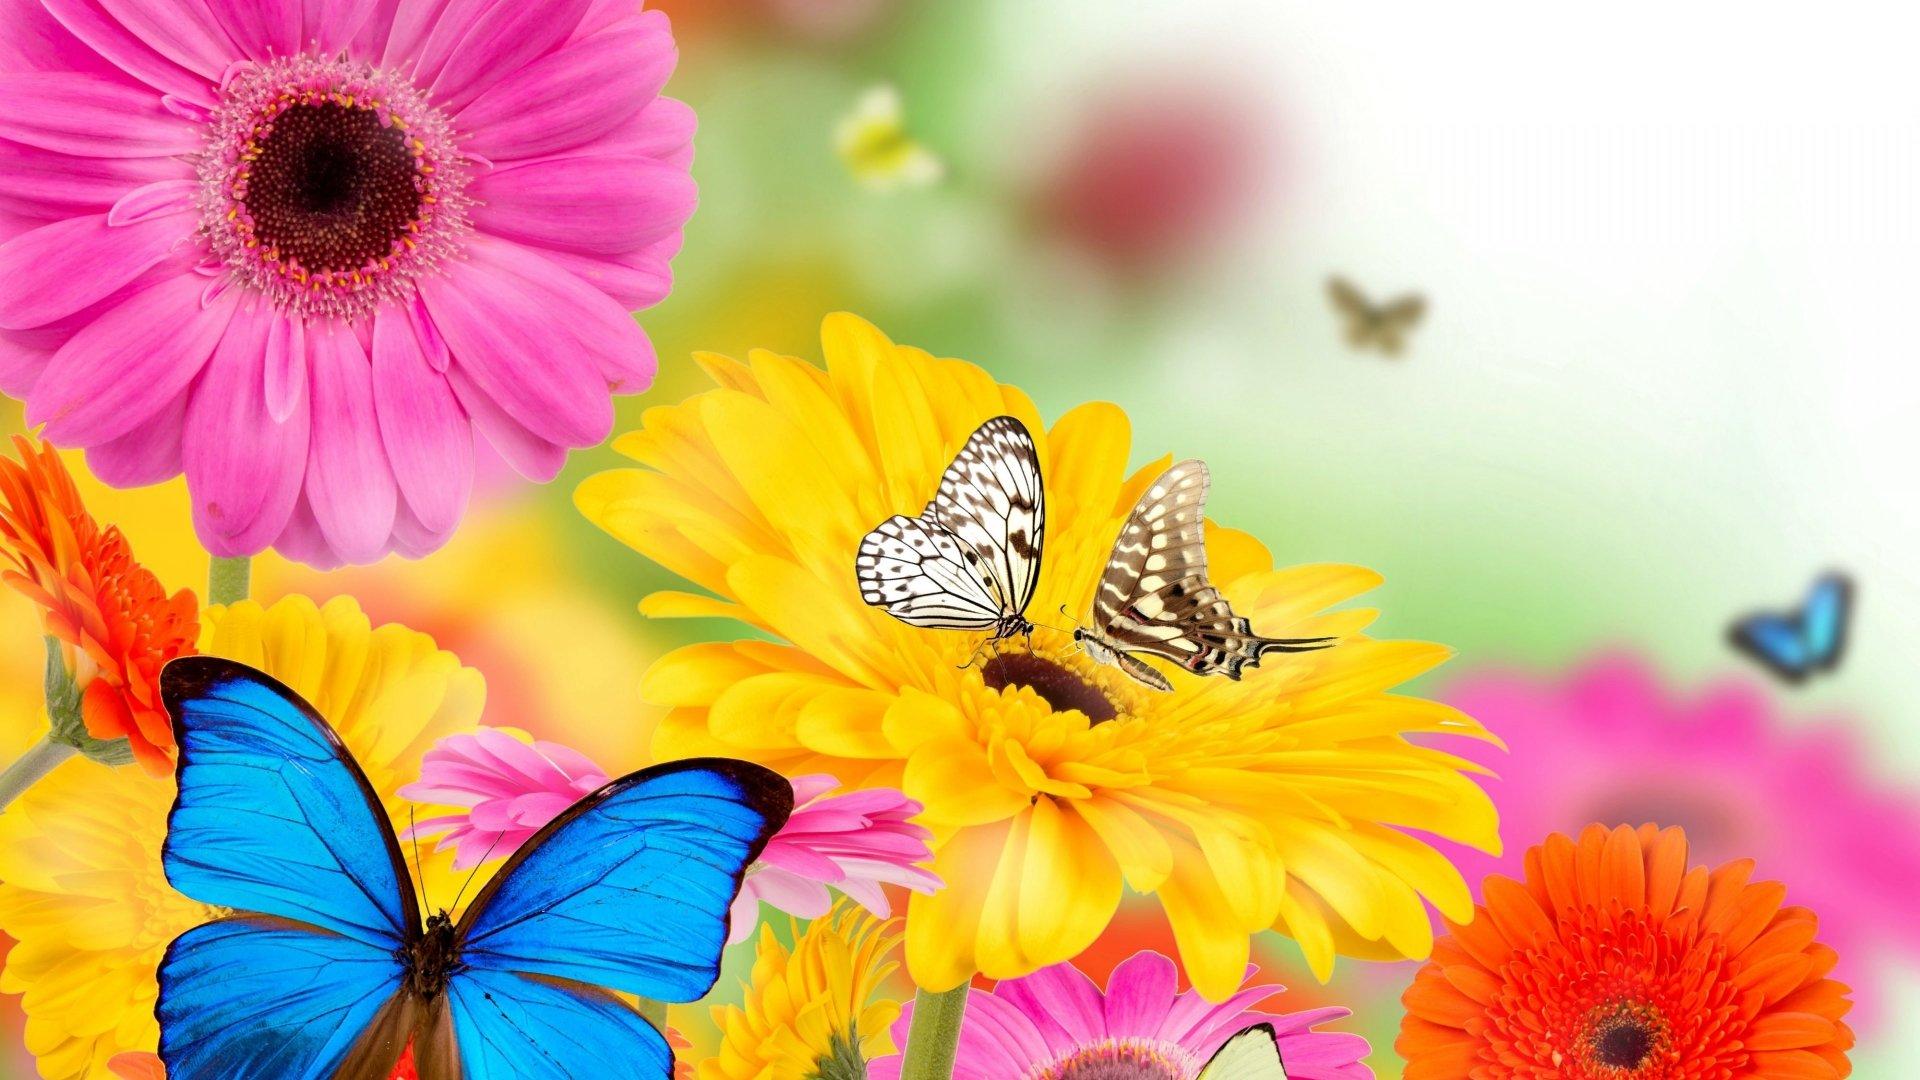 Artistic - Collage  Artistic Spring Butterfly Blue Flower Gerbera Yellow Flower Pink Flower Wallpaper